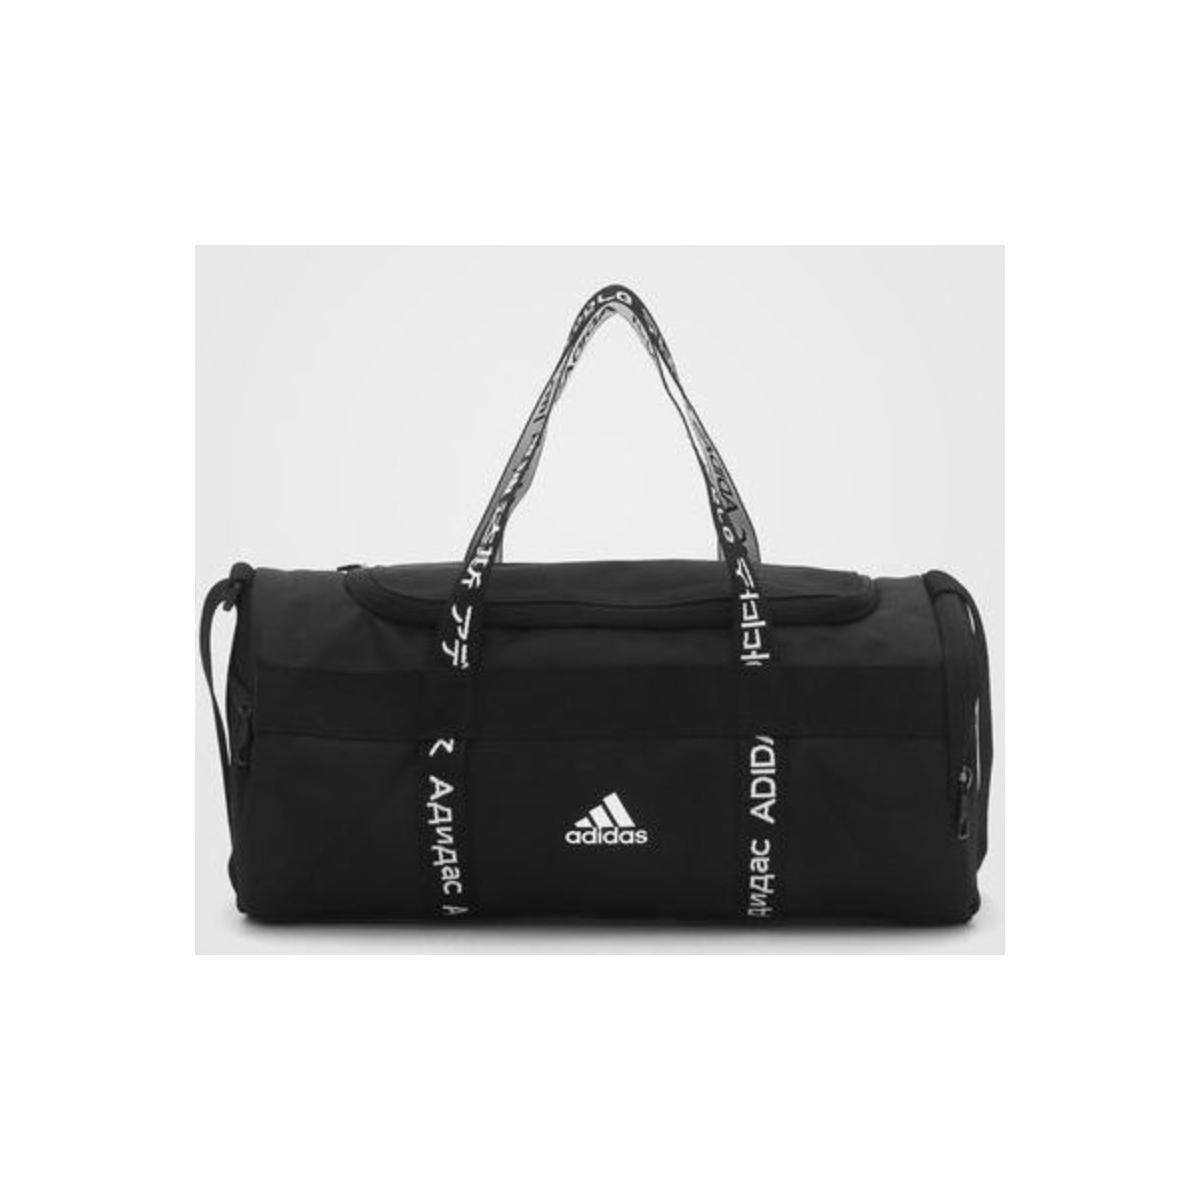 Mala Unisex Adidas Fj4455 4athlts pp Preto